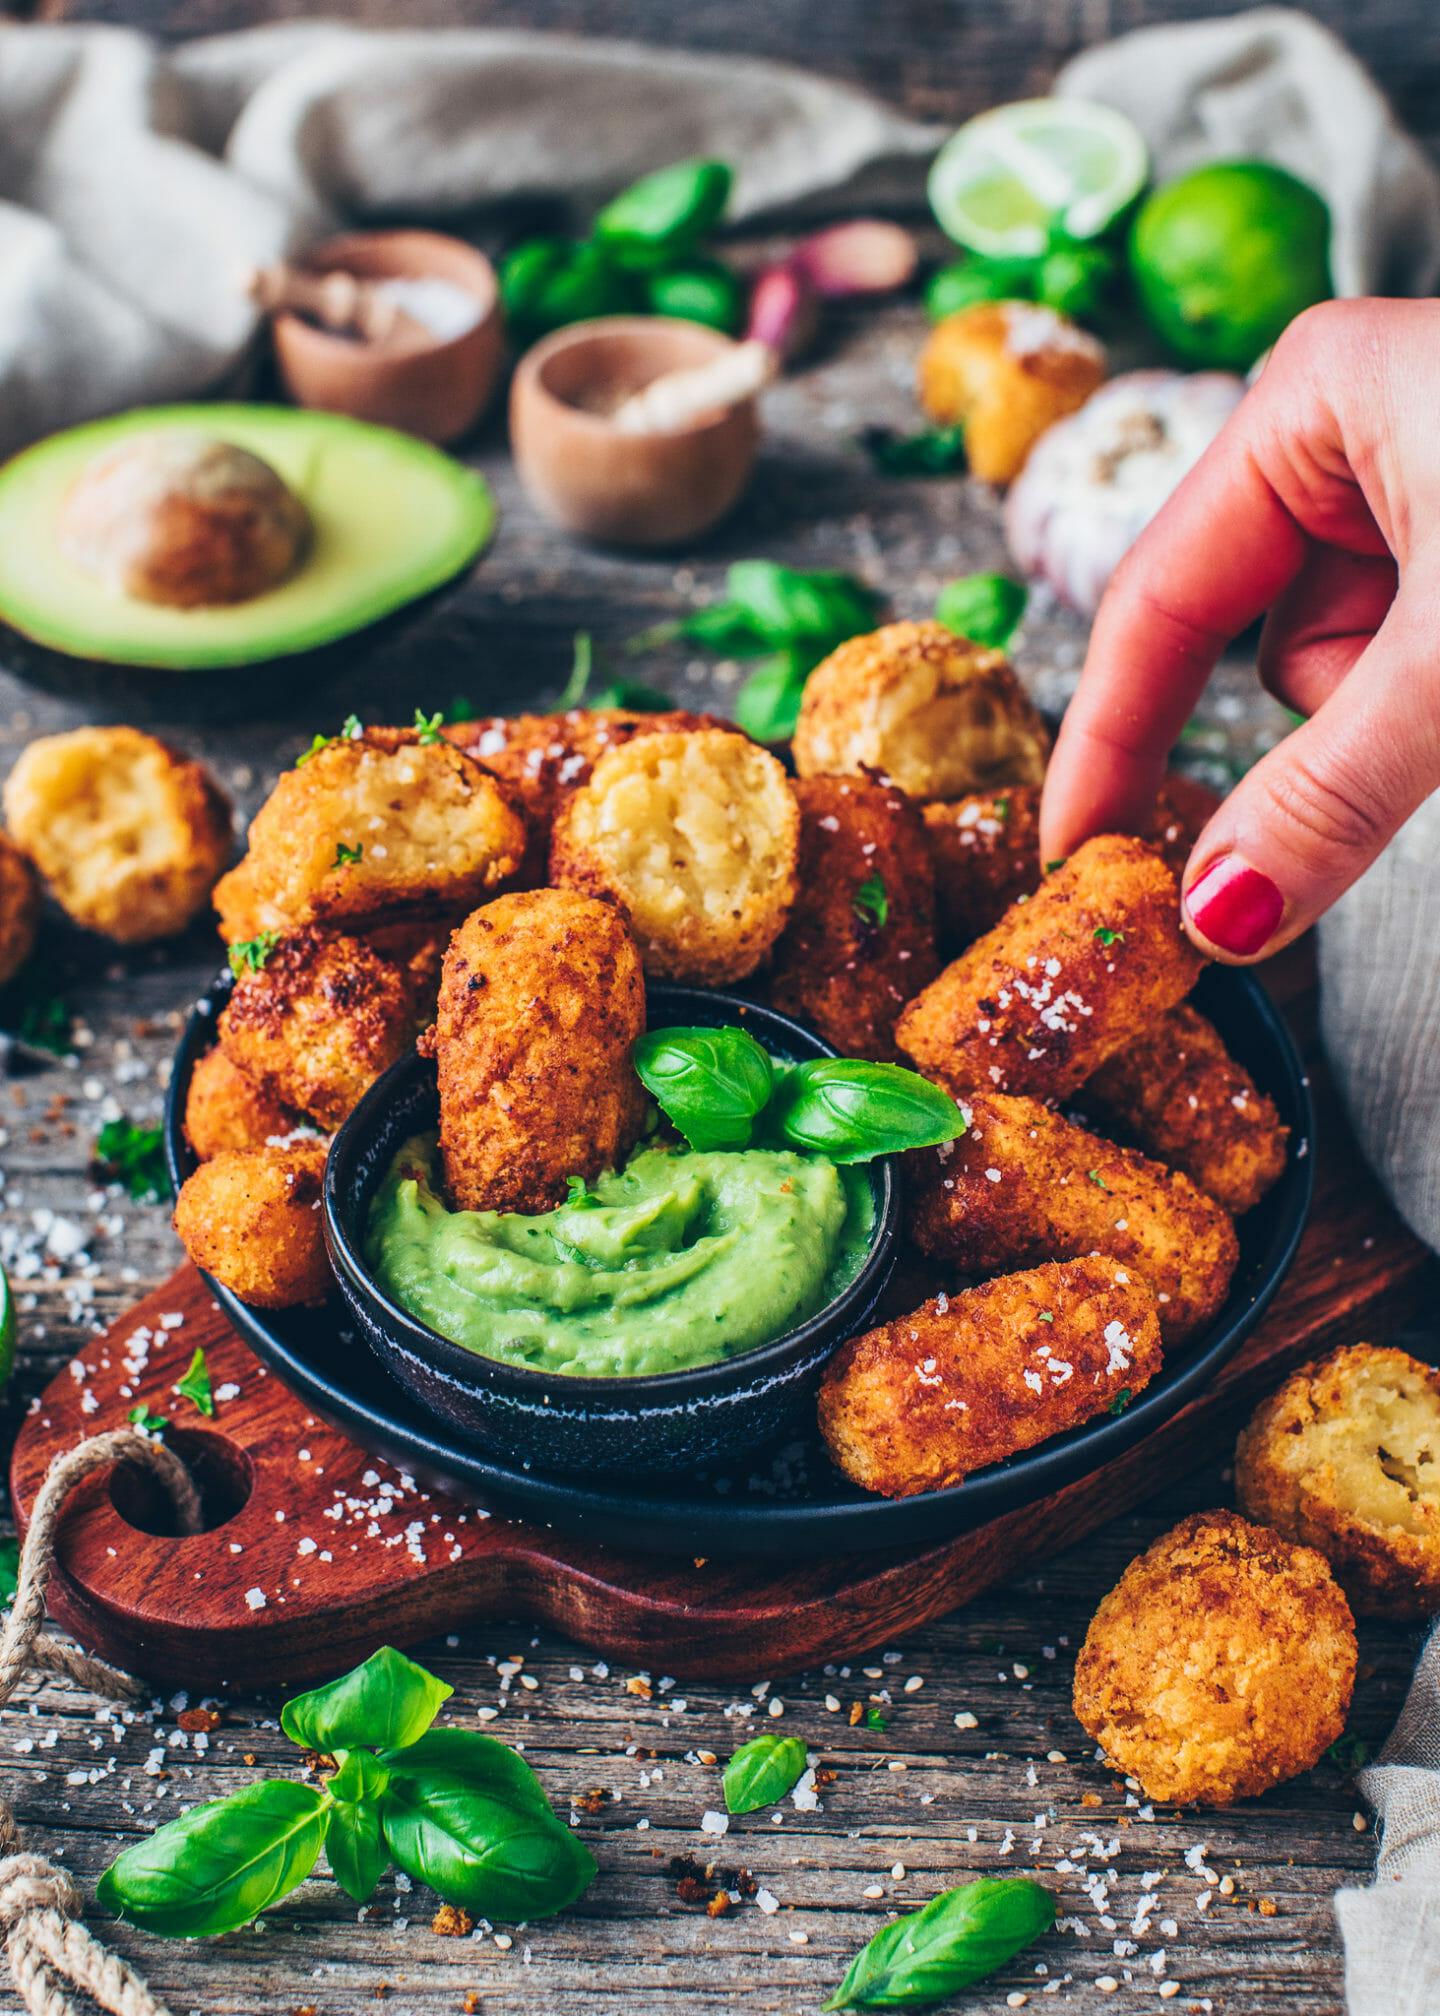 homemade potato croquettes with avocado guacamole